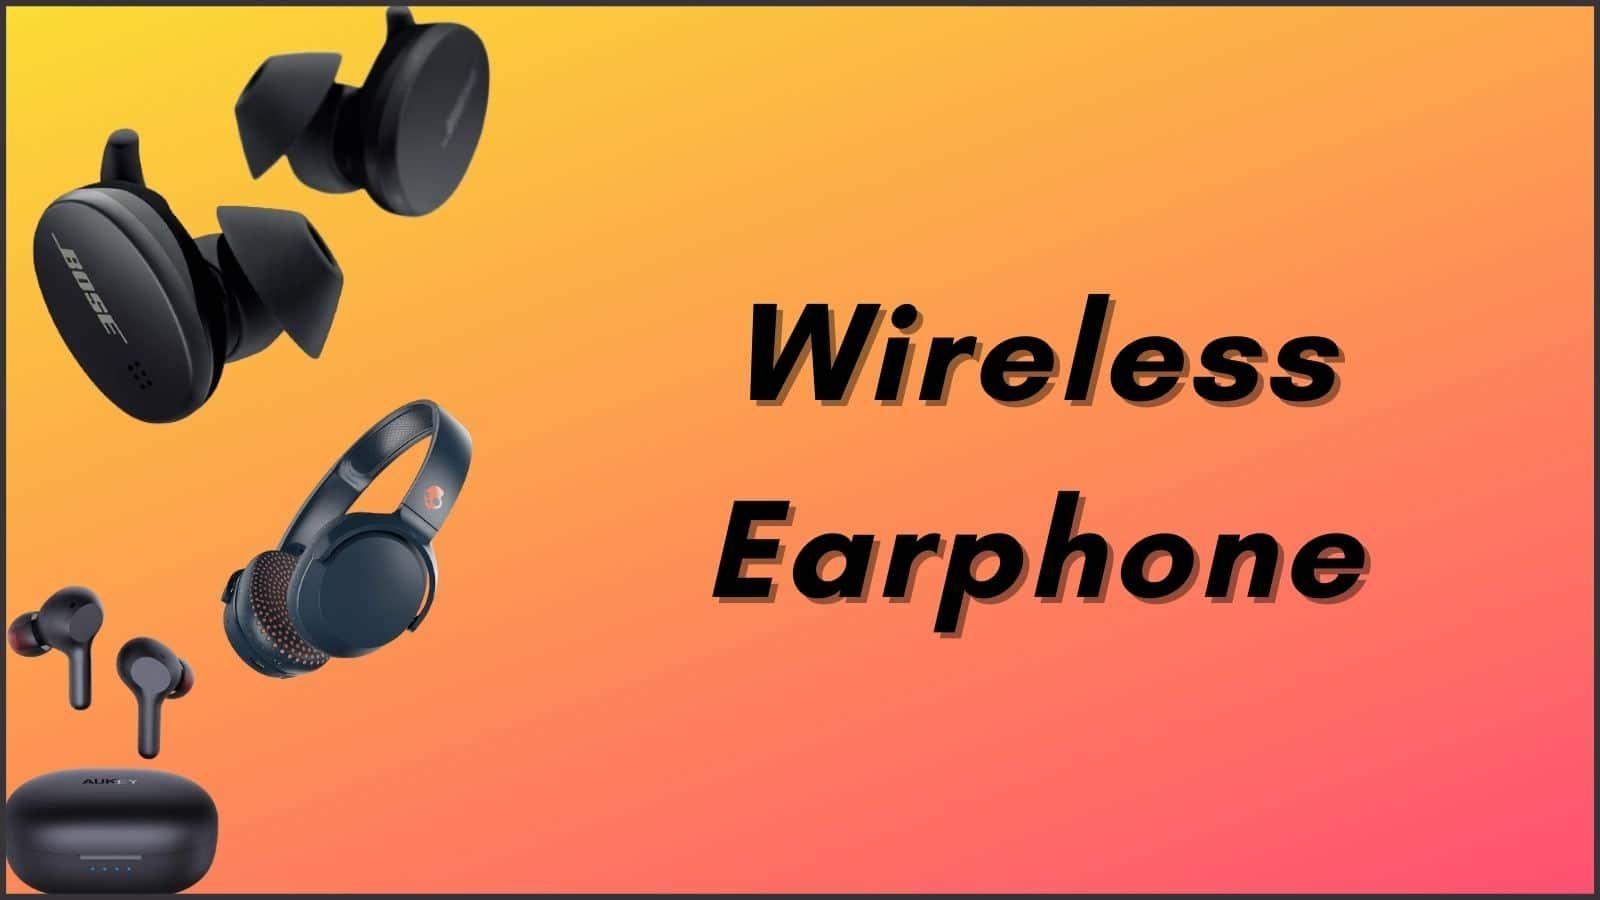 Wireless Earphones